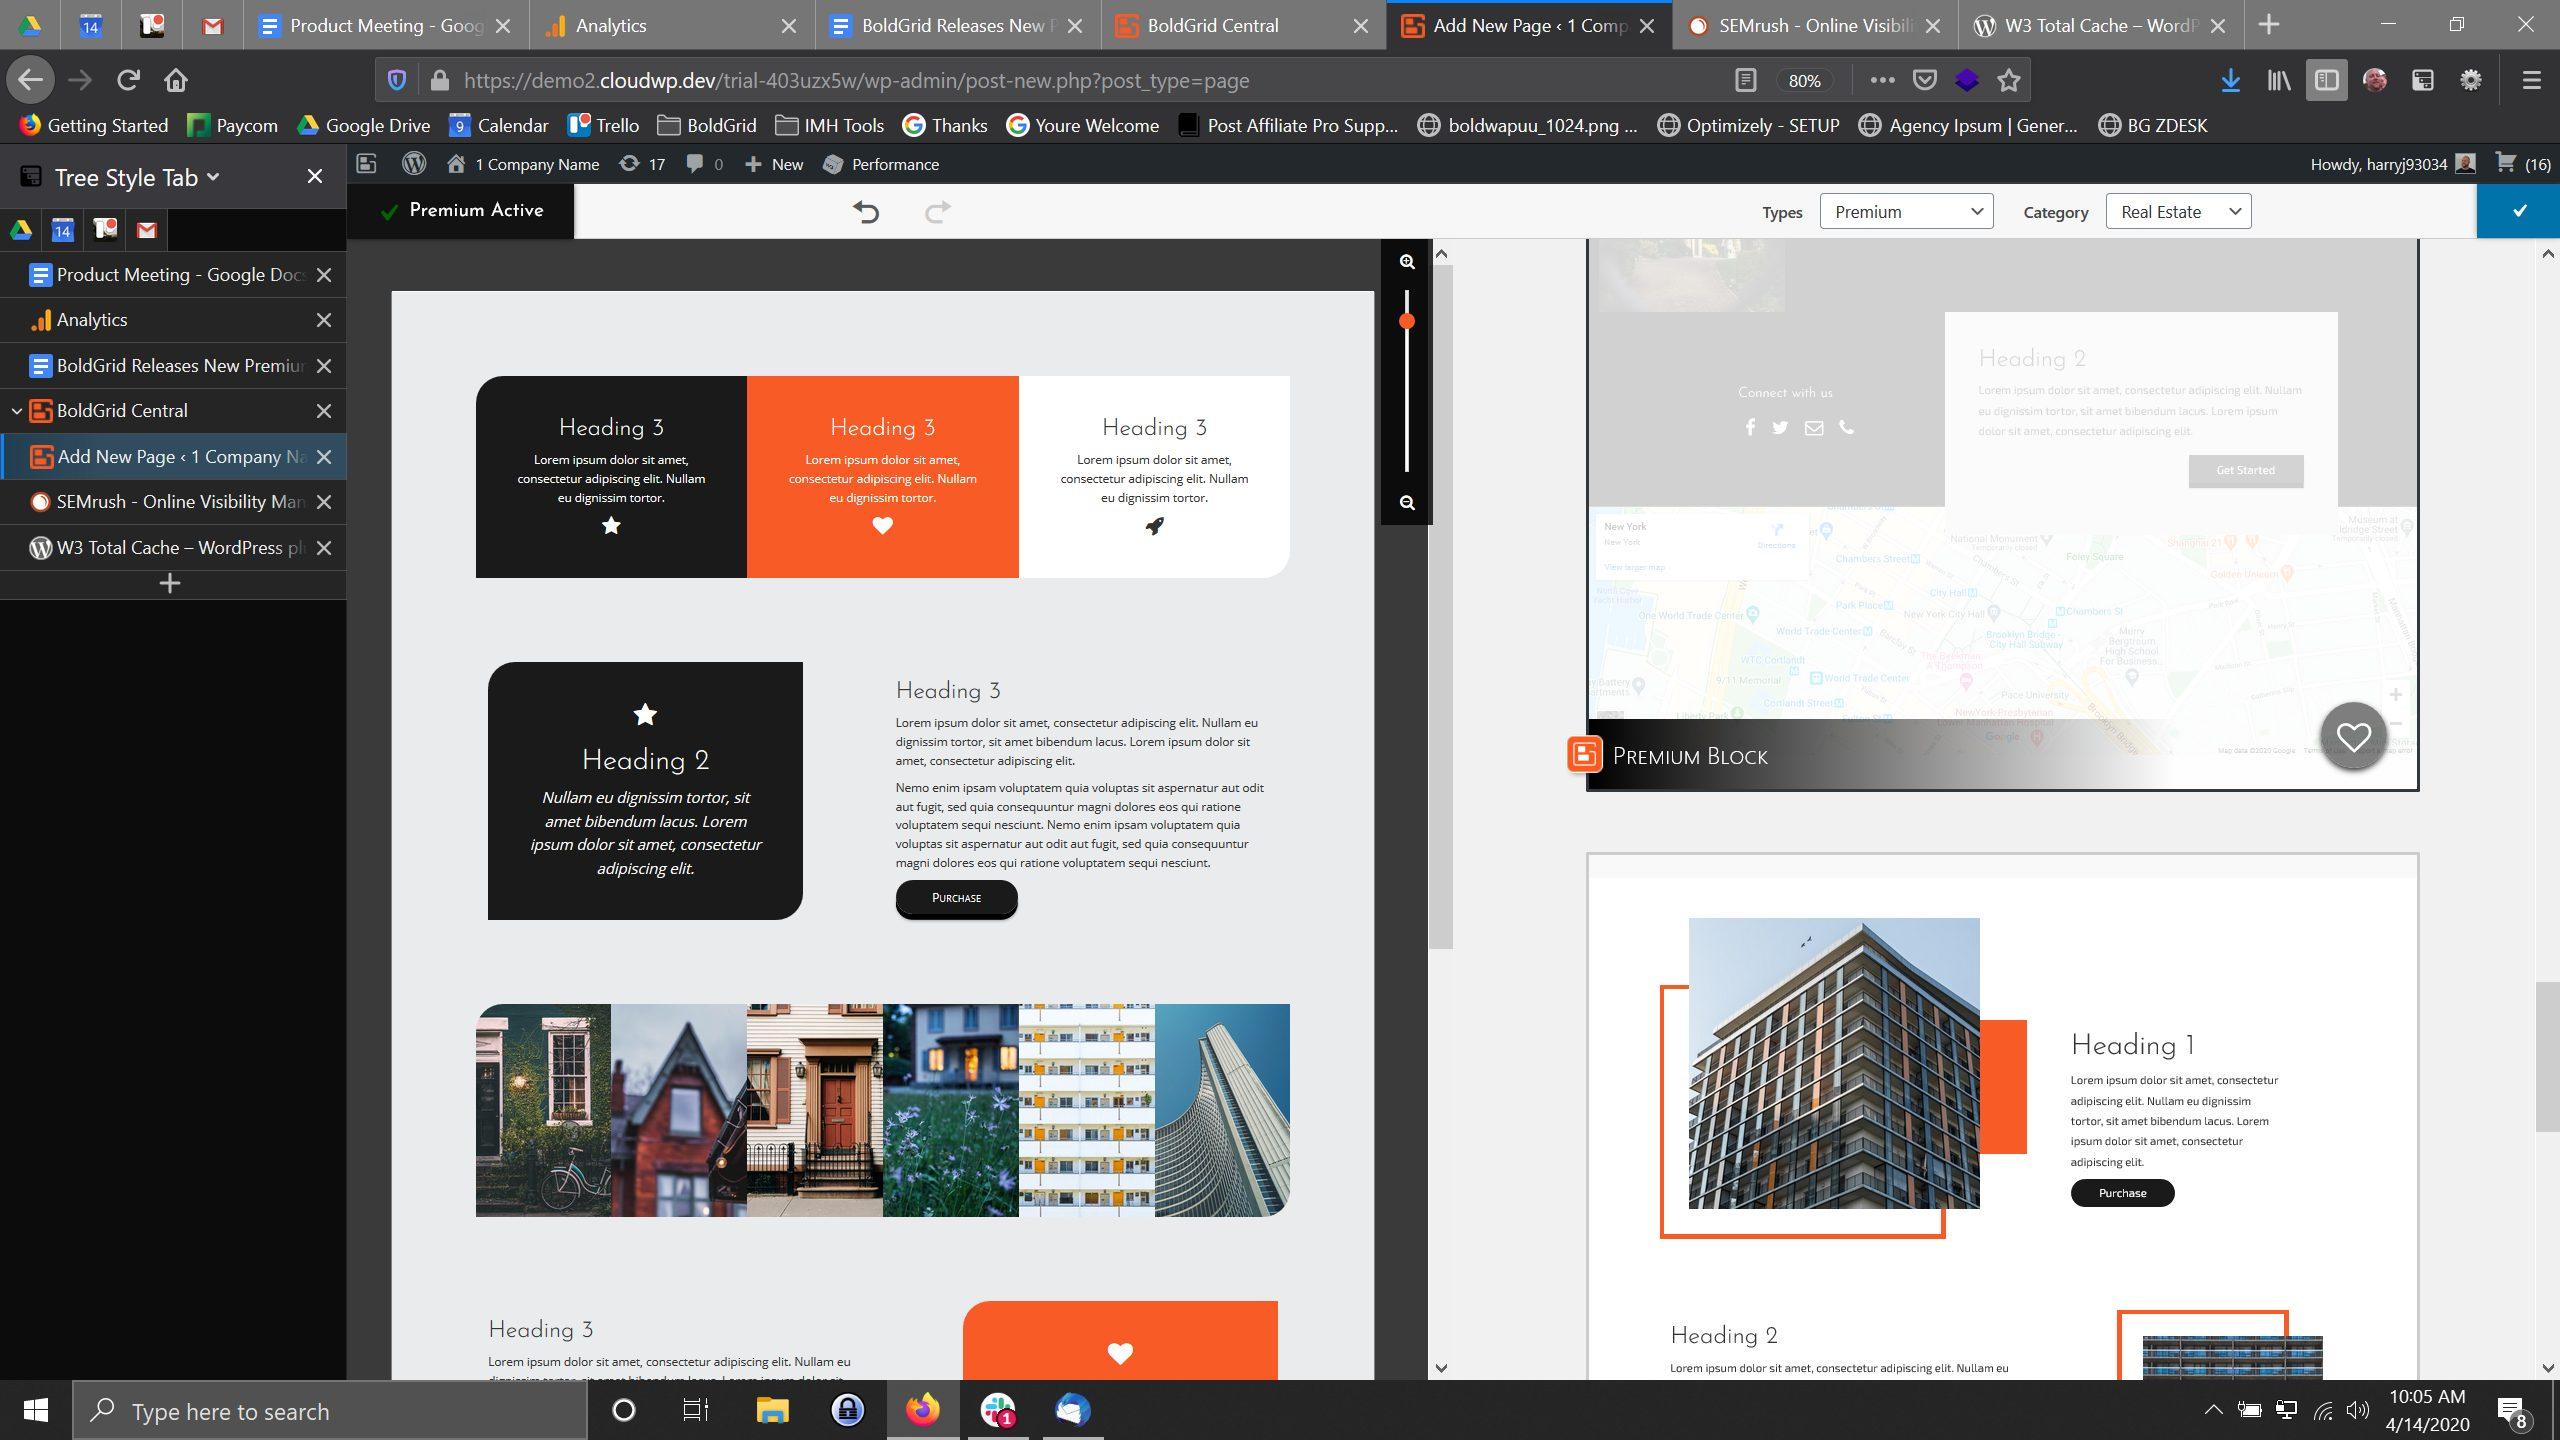 Adding Premium WordPress Blocks using the Post and Page Builder plugin